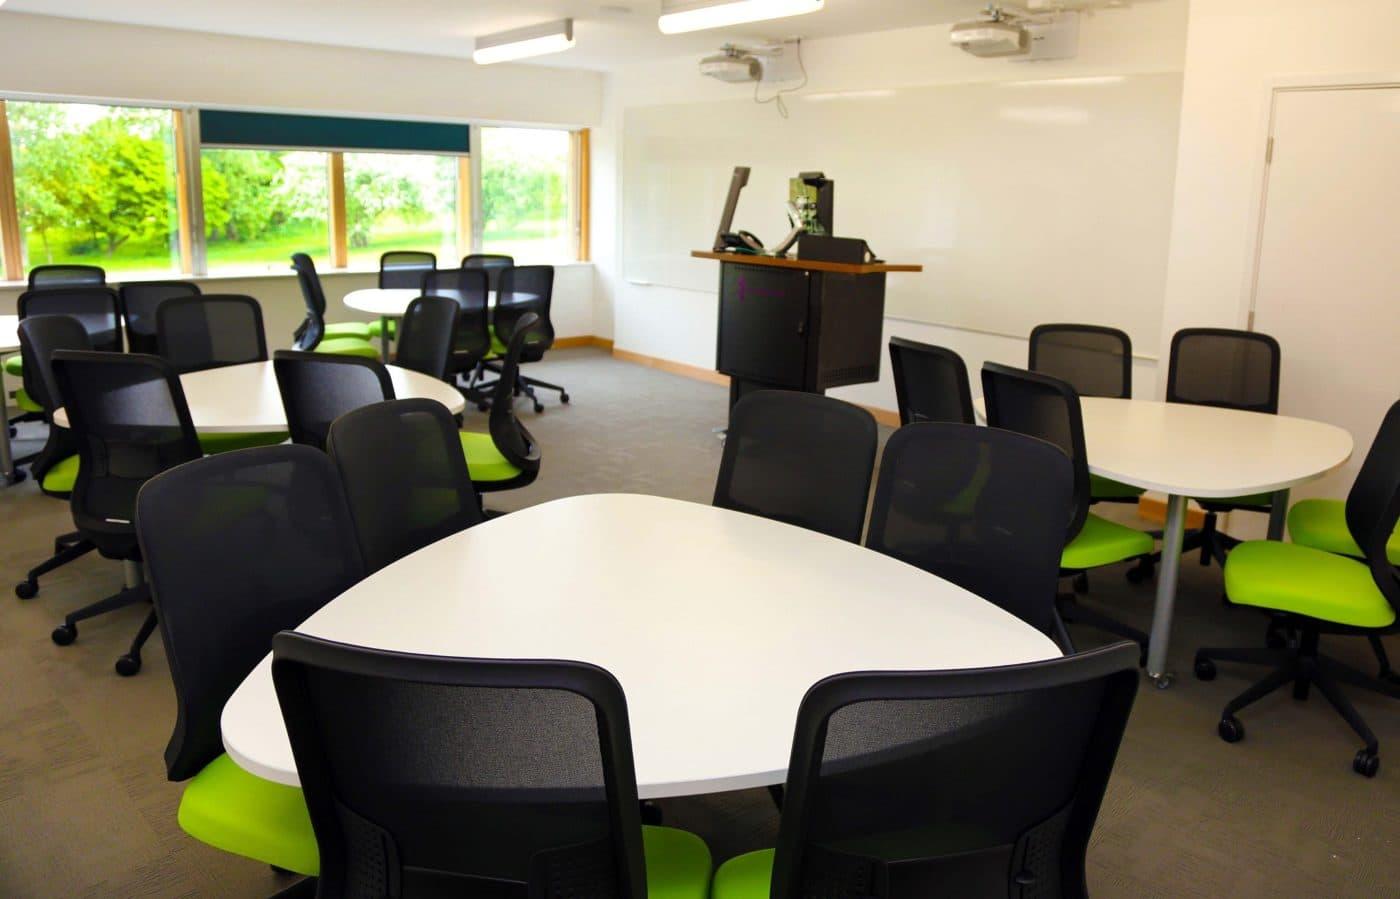 The Essex Business School meeting